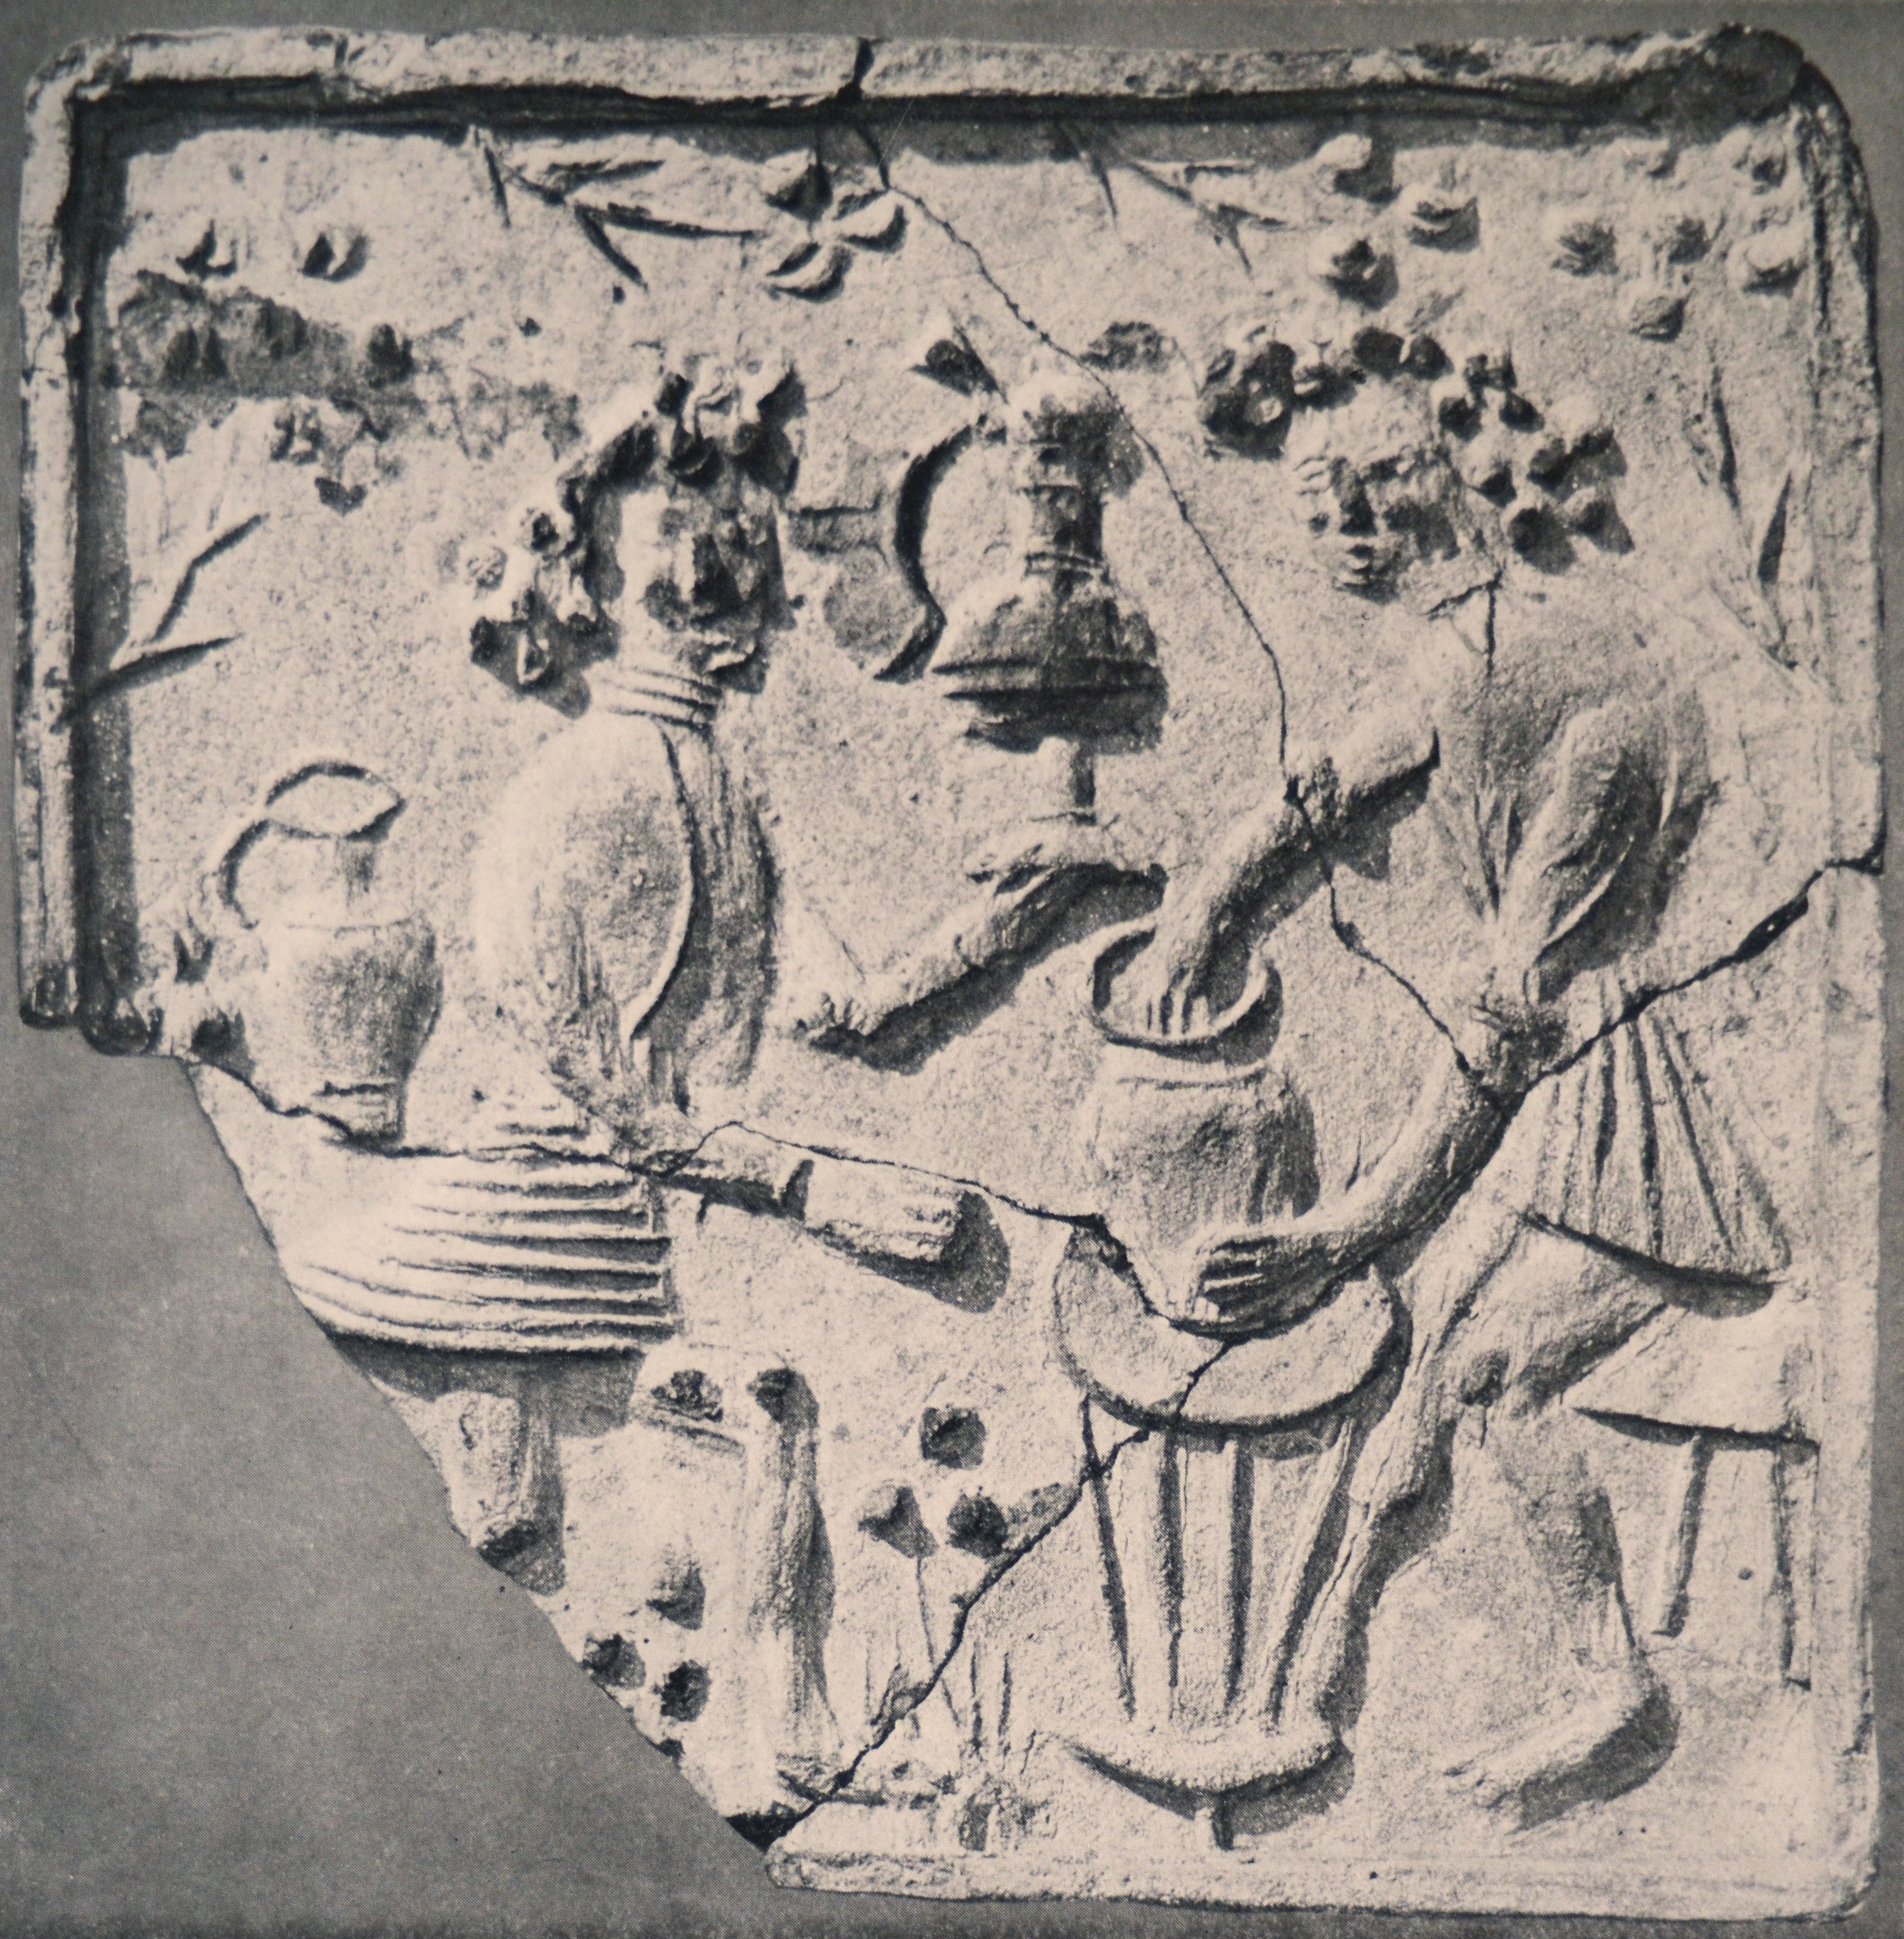 image 15 Tile from Lichnice Manor, Čáslav, Eastern Bohemia, second hald of the 15th century, District Museum Čáslav, Frič Collection